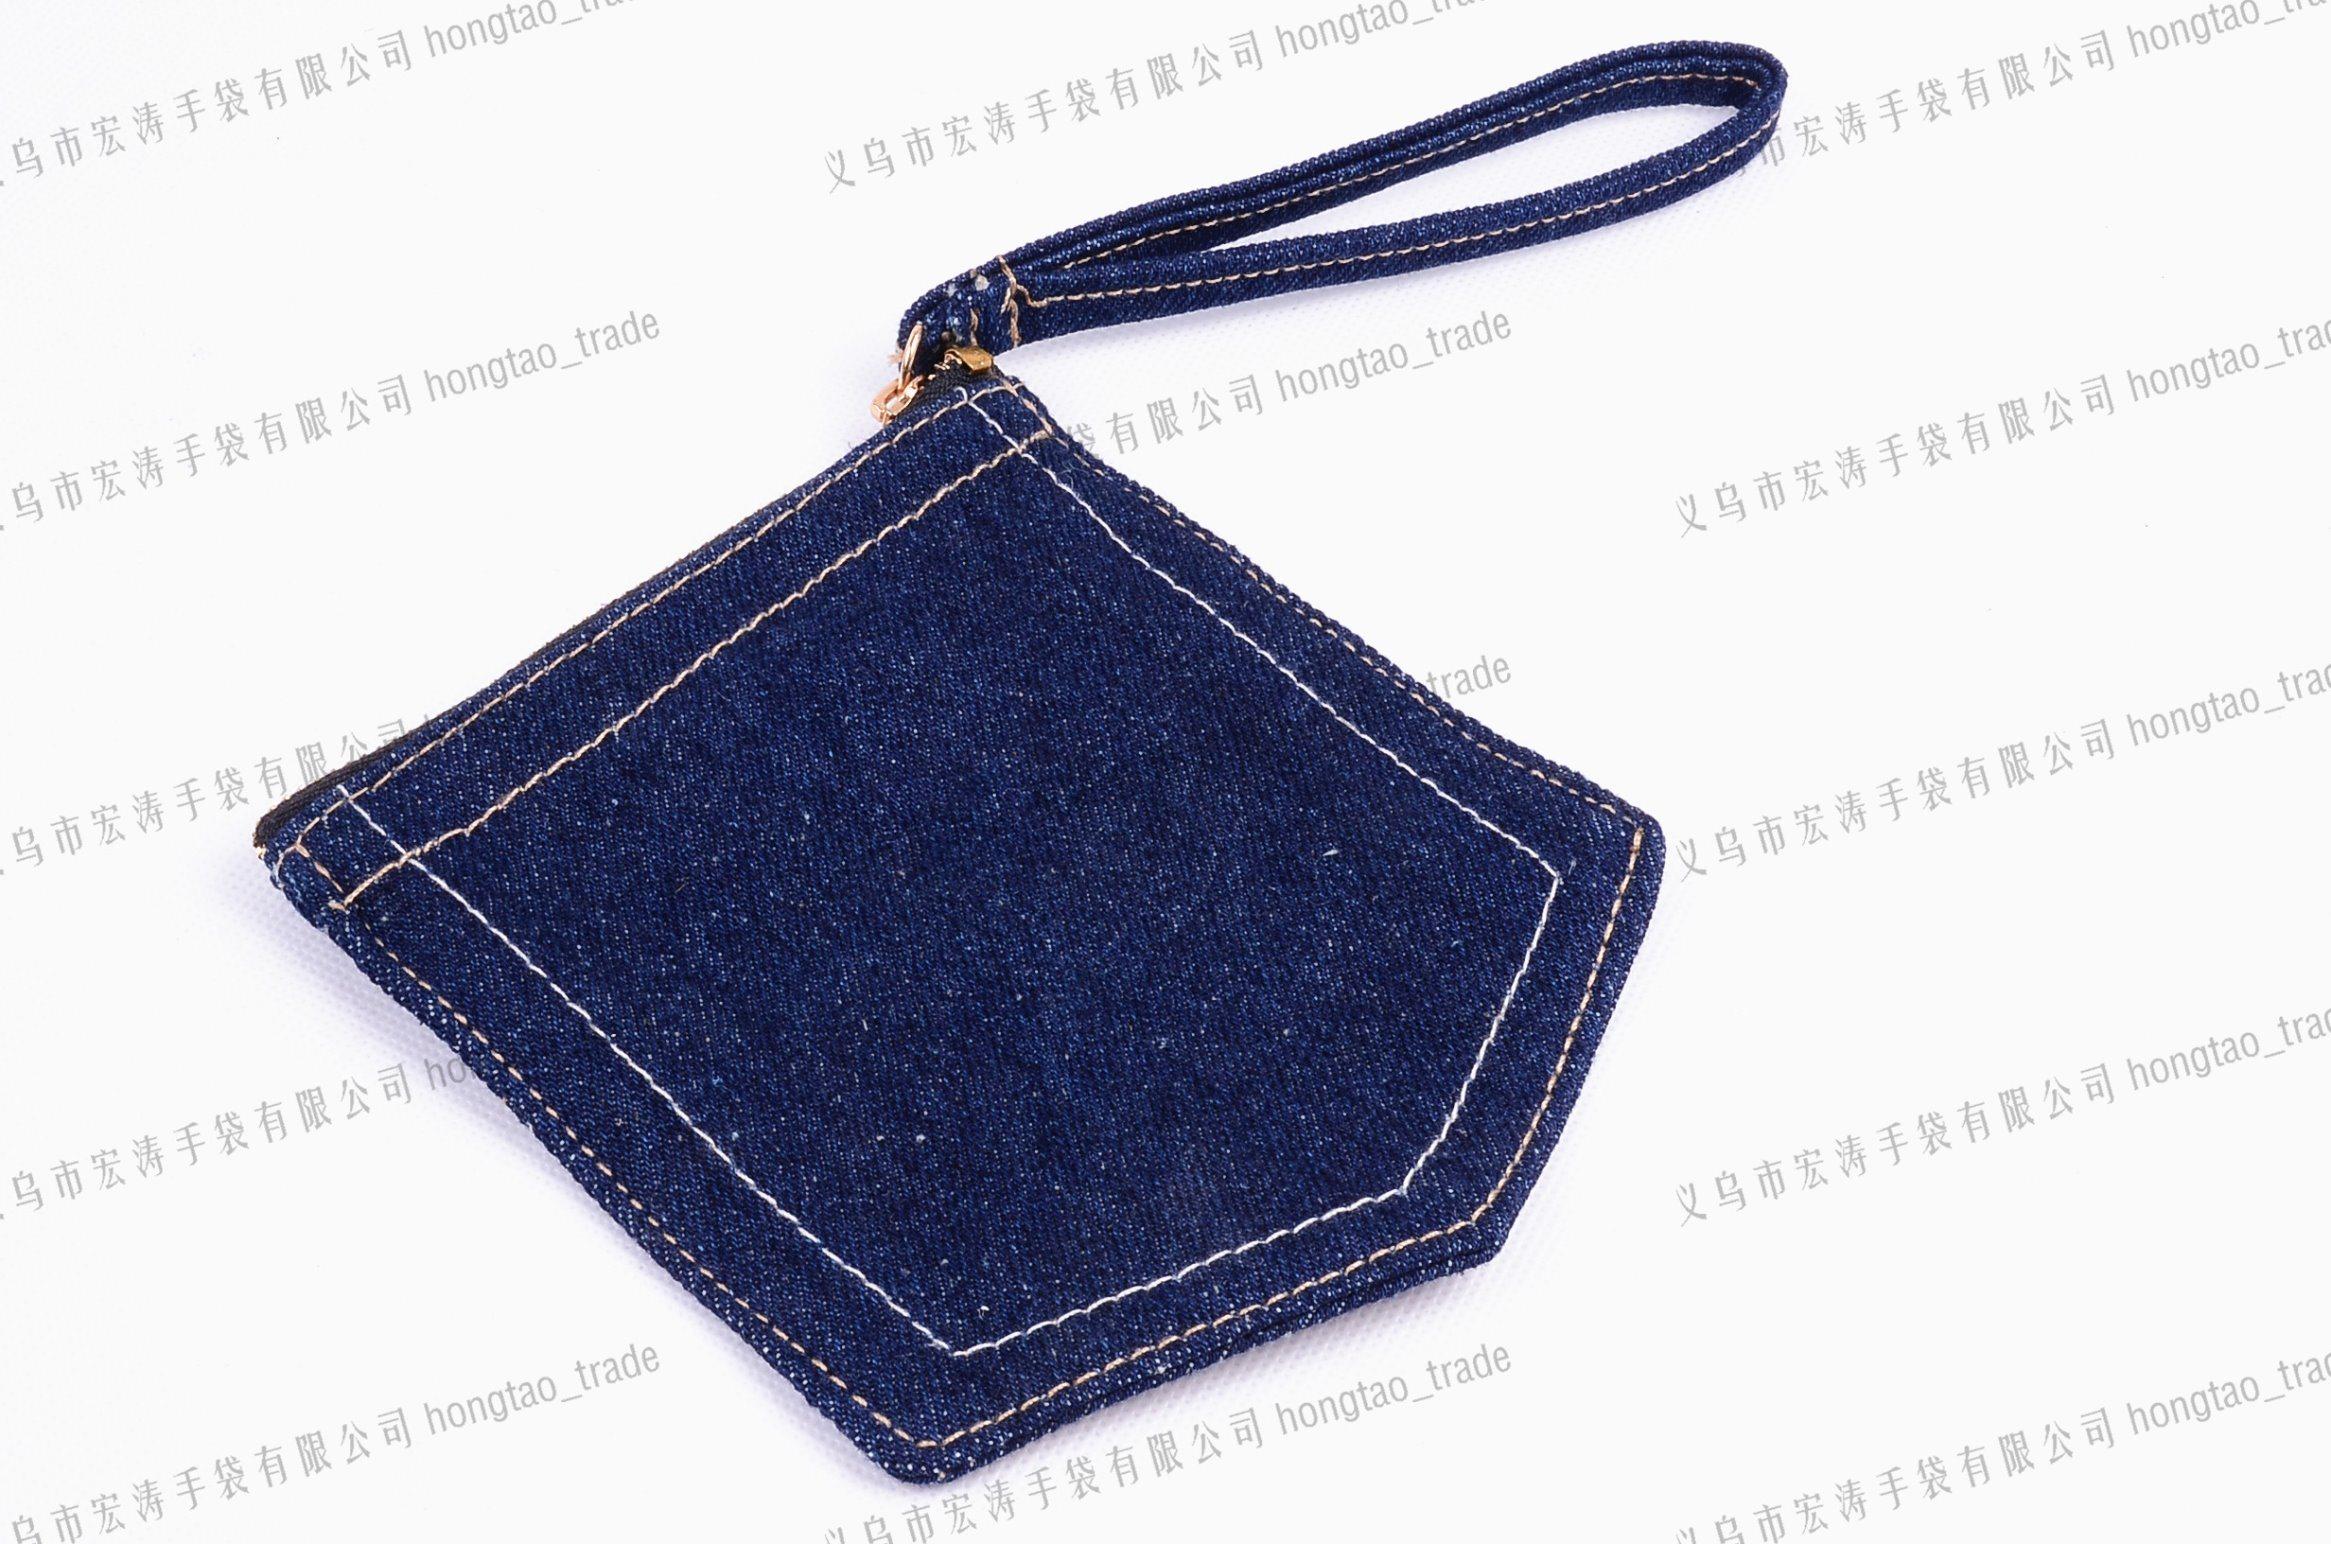 Denim Handbag with Handle Stamp Logo on PU Gift Promo Bag14oz Jean Pocket